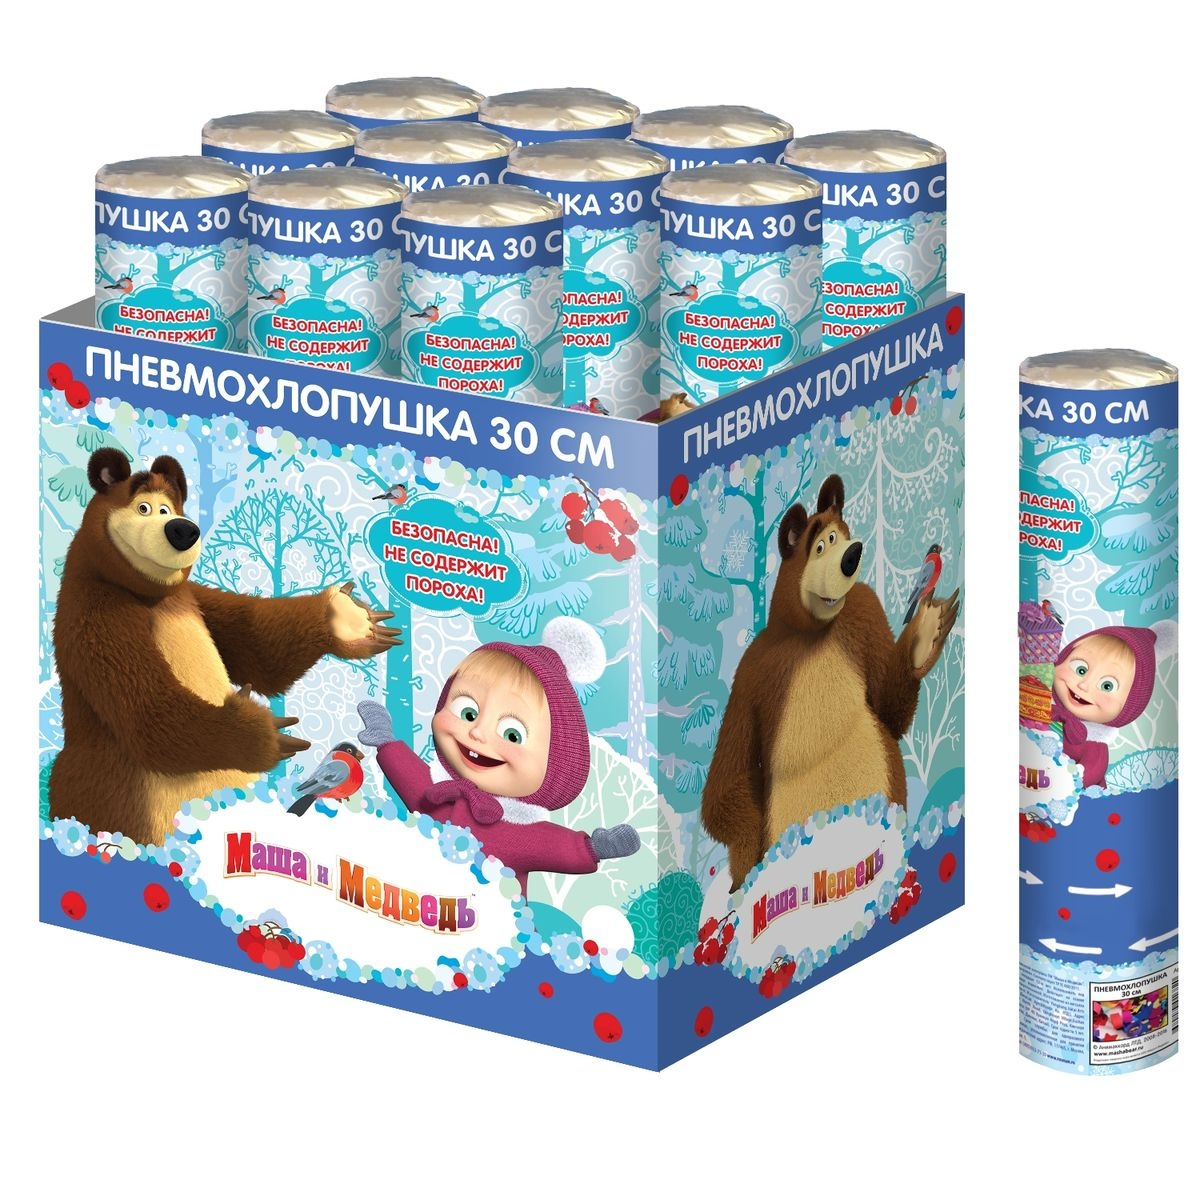 Декор Маша и Медведь Хлопушка-конфетти Маша и Медведь 30 см кукла маша в красном сарафане маша и медведь